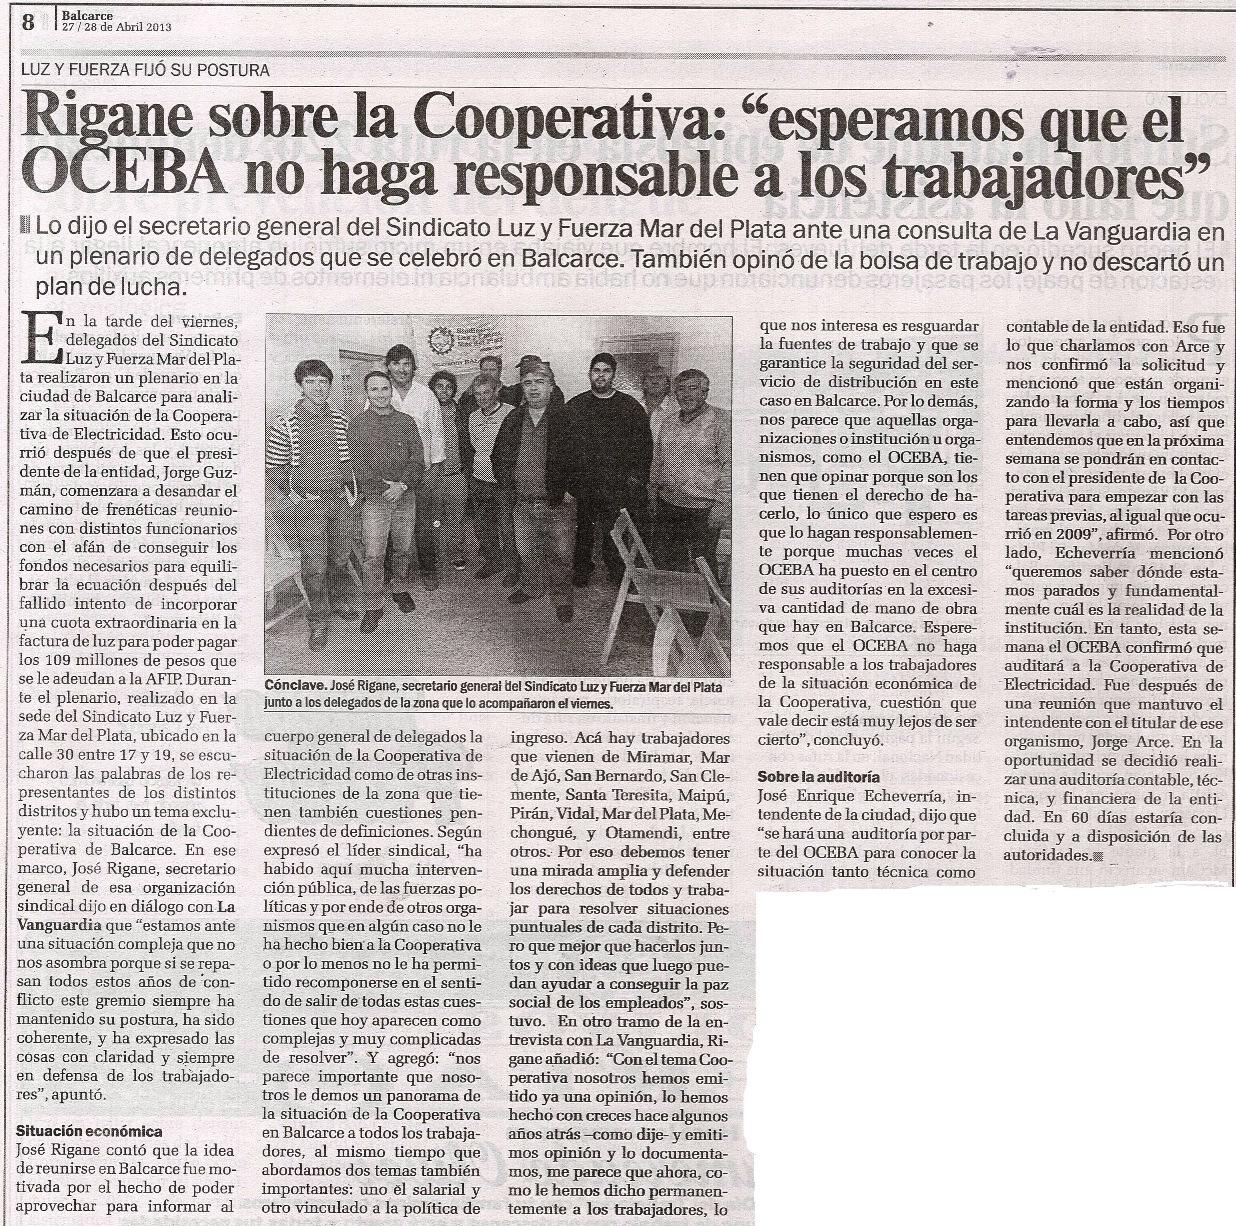 Rigane sobre Cooperativa Balcarce: